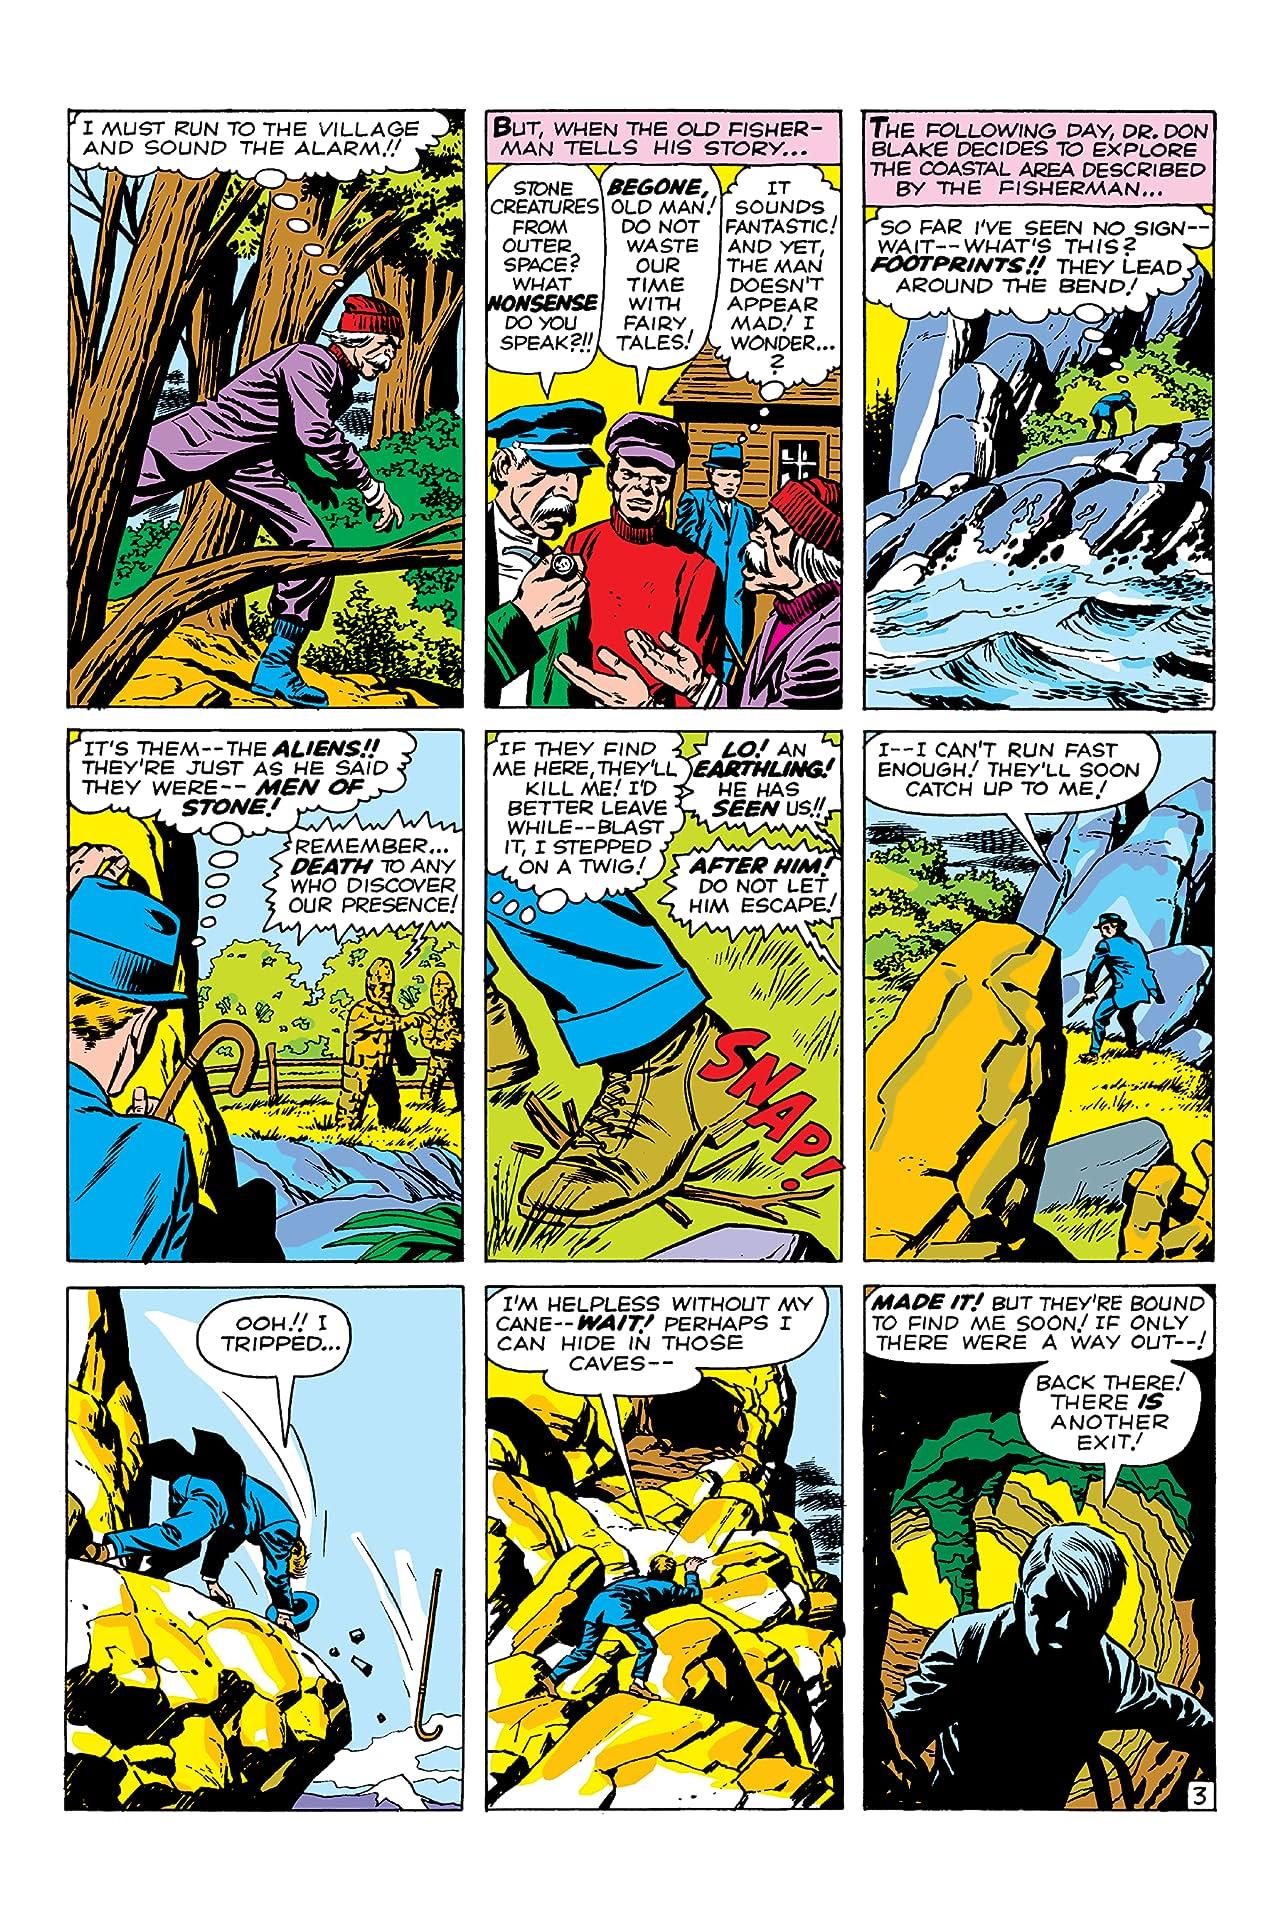 Mighty Marvel Masterworks: The Mighty Thor Vol. 1: The Vengeance Of Loki